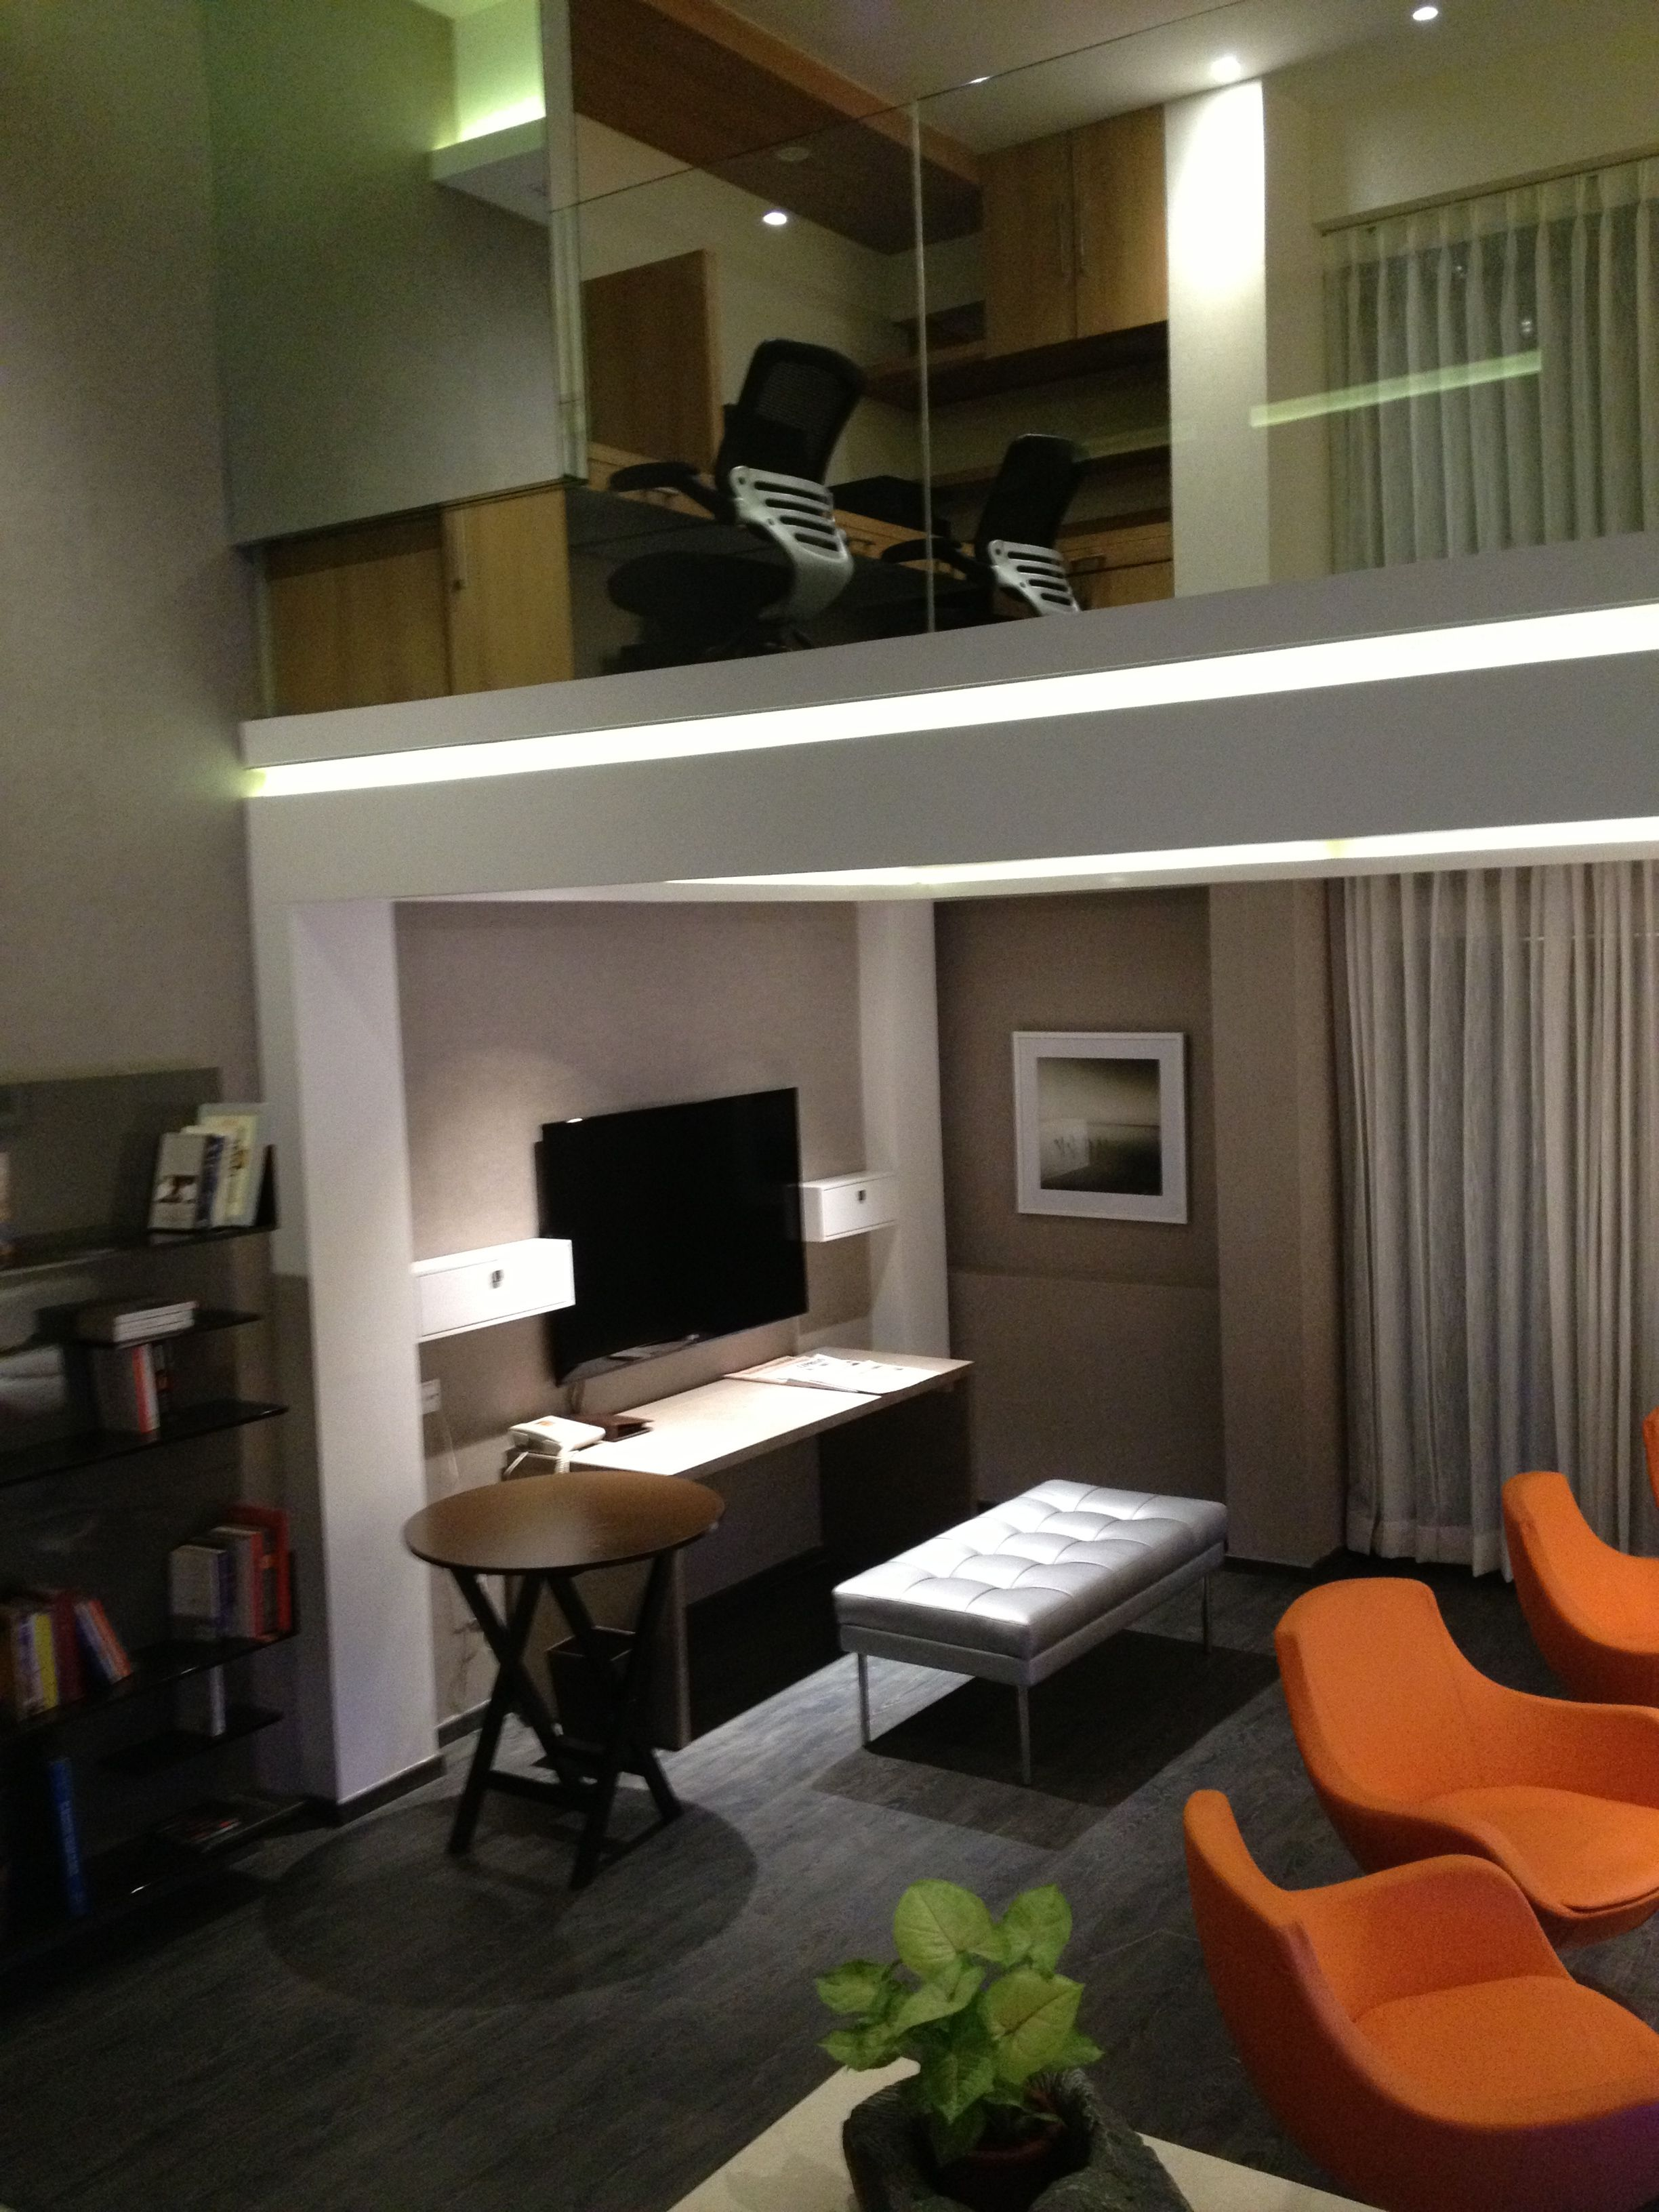 @ indside #theatara  #boutiquehotels #luxuryhotesgurgoan #boutiquehotelsgurgaon